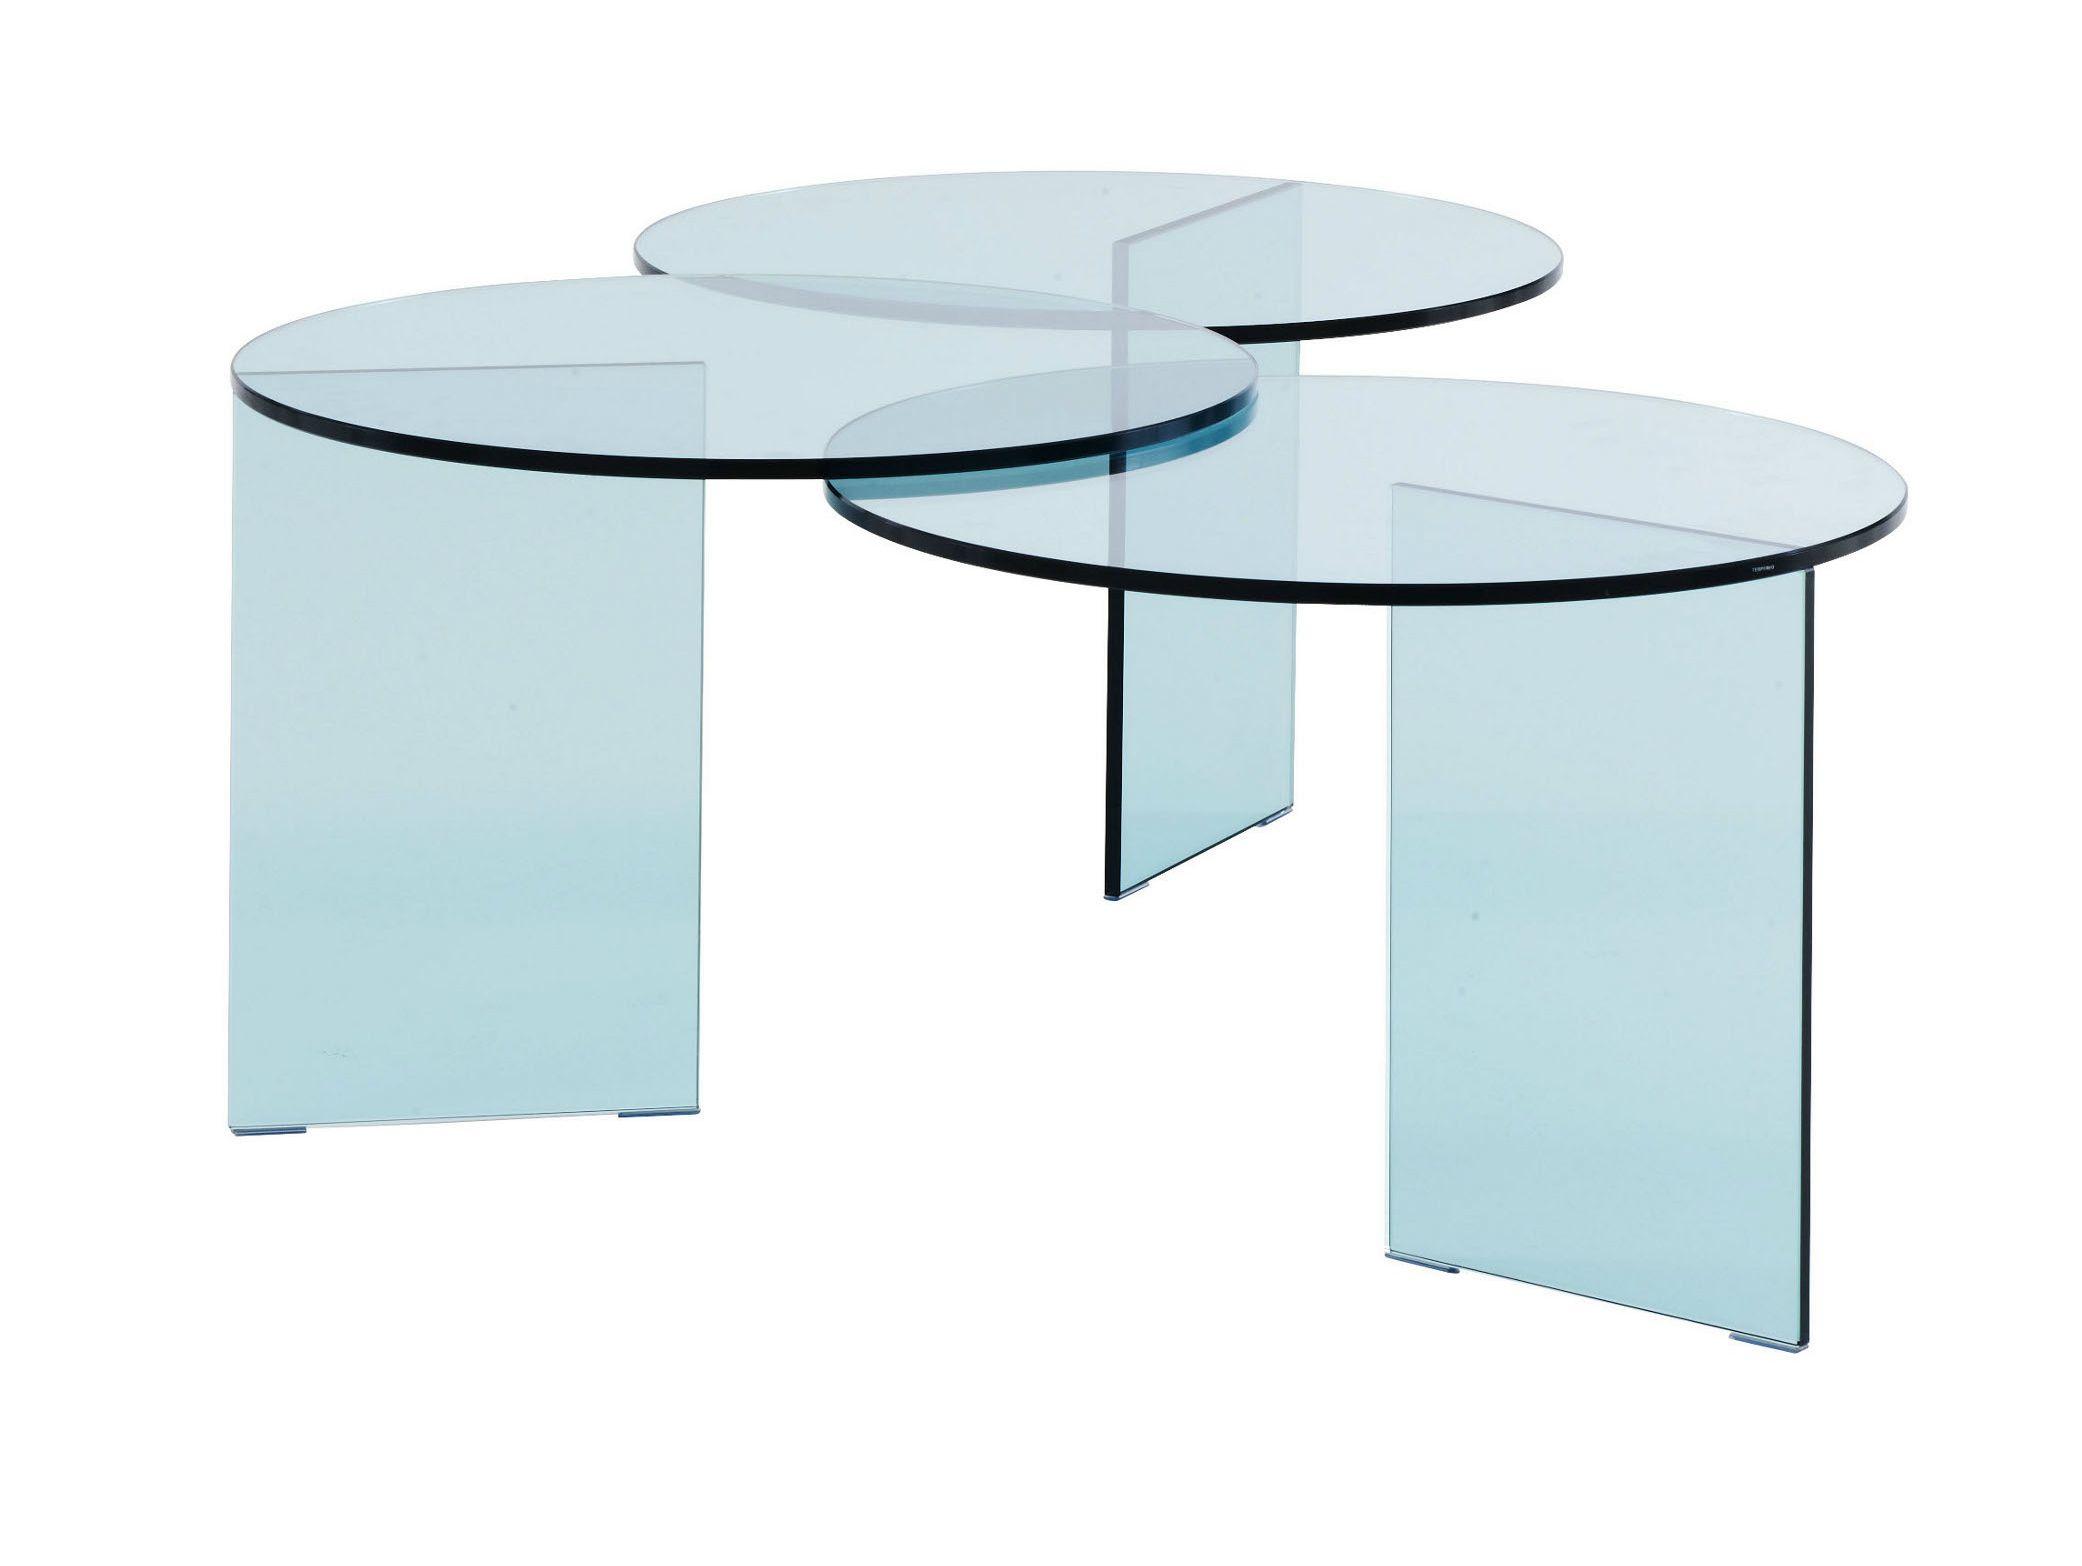 table basse ronde en verre tremp aoyama by roset italia. Black Bedroom Furniture Sets. Home Design Ideas